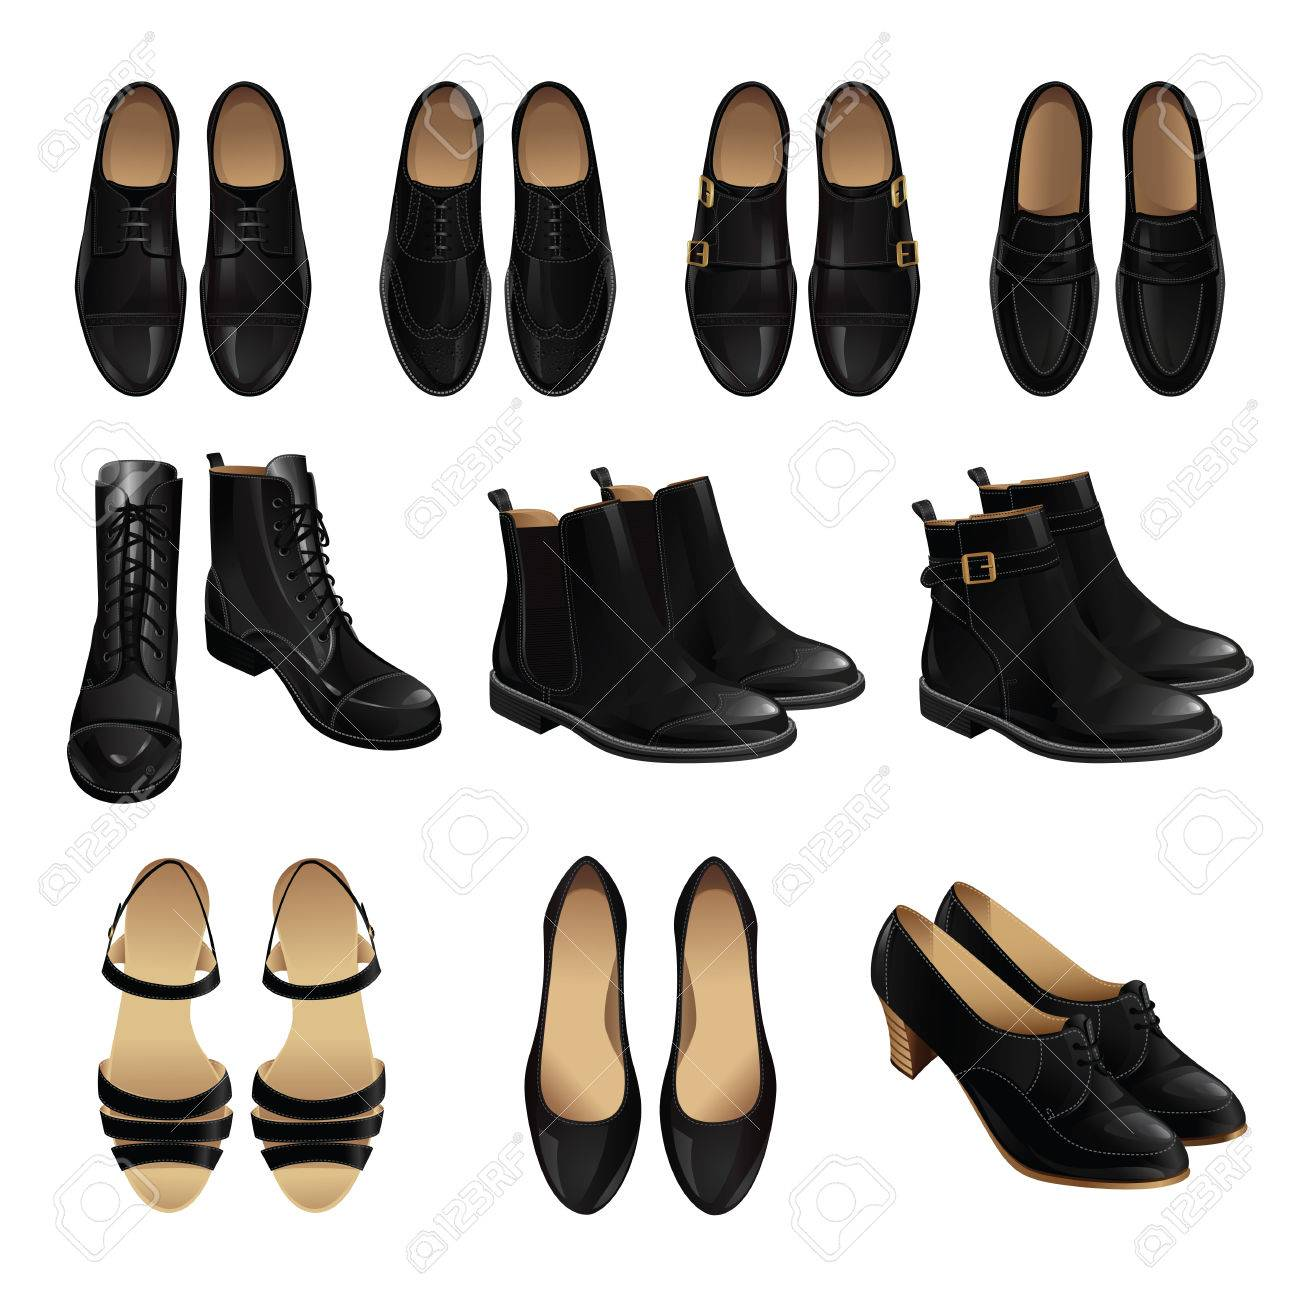 Zapatos negros formales Art para hombre LzMAUlR